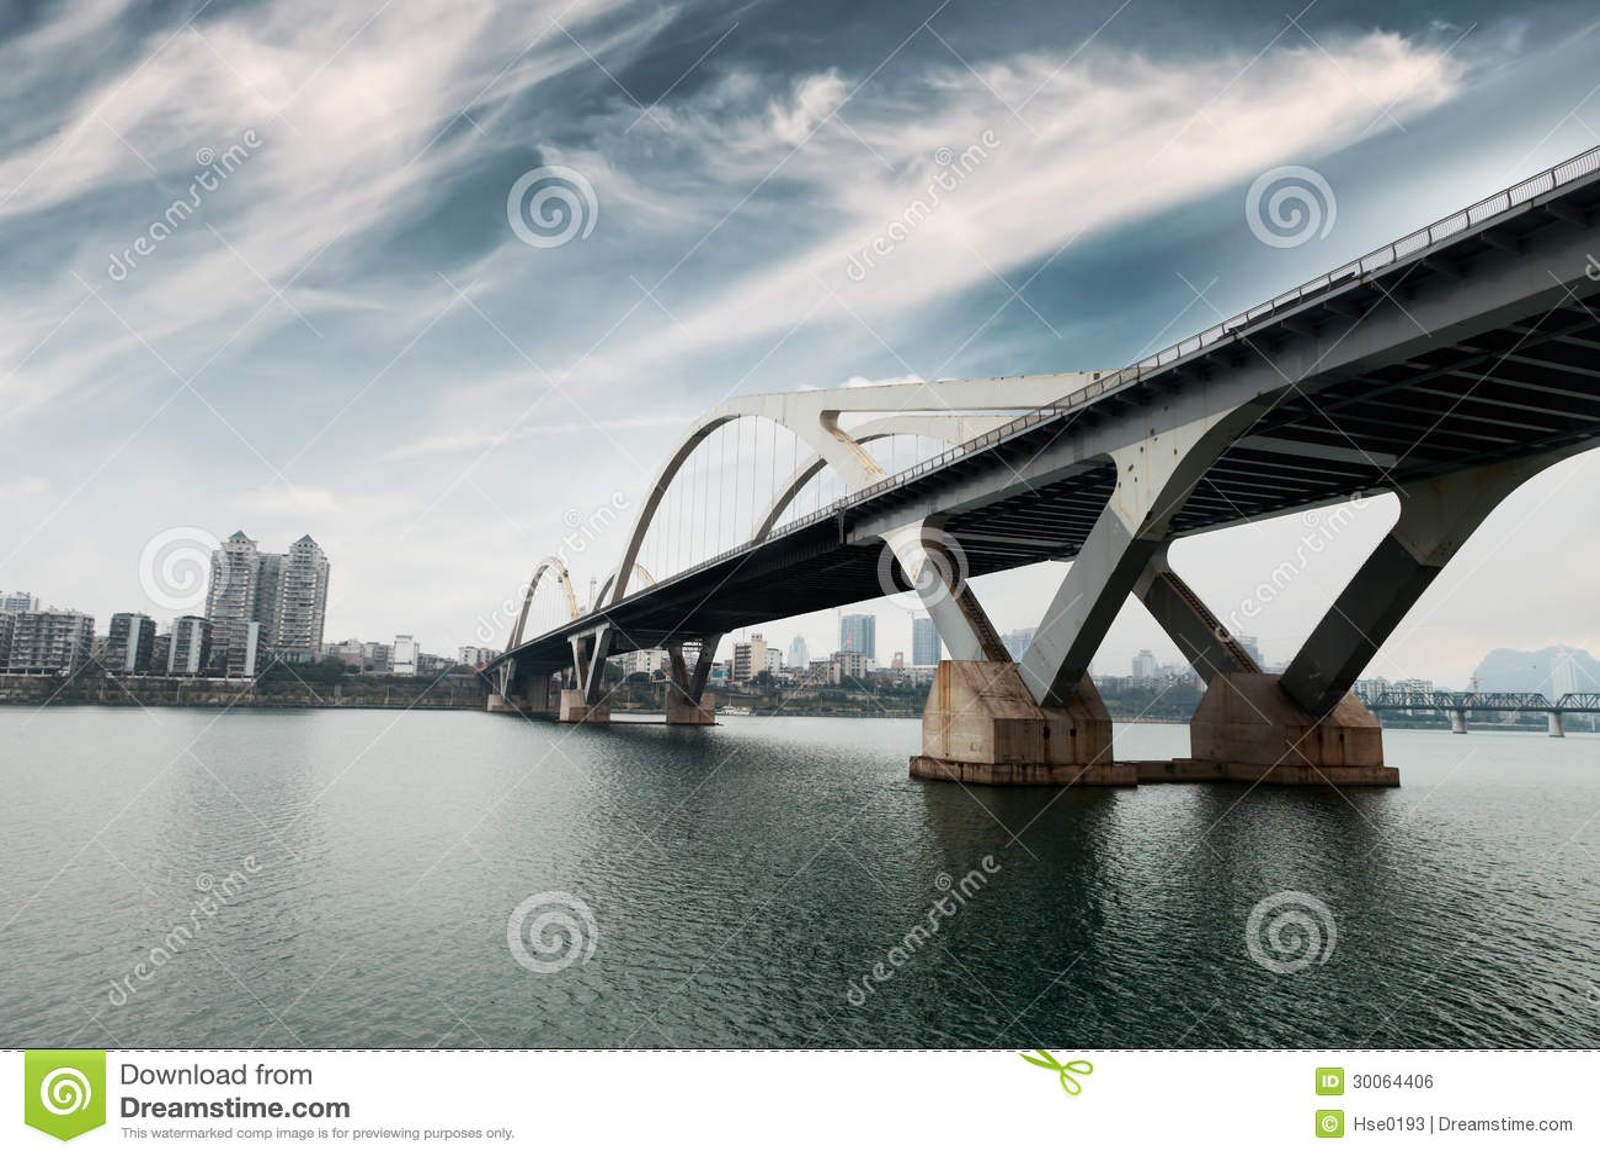 Modern arch bridge in south China